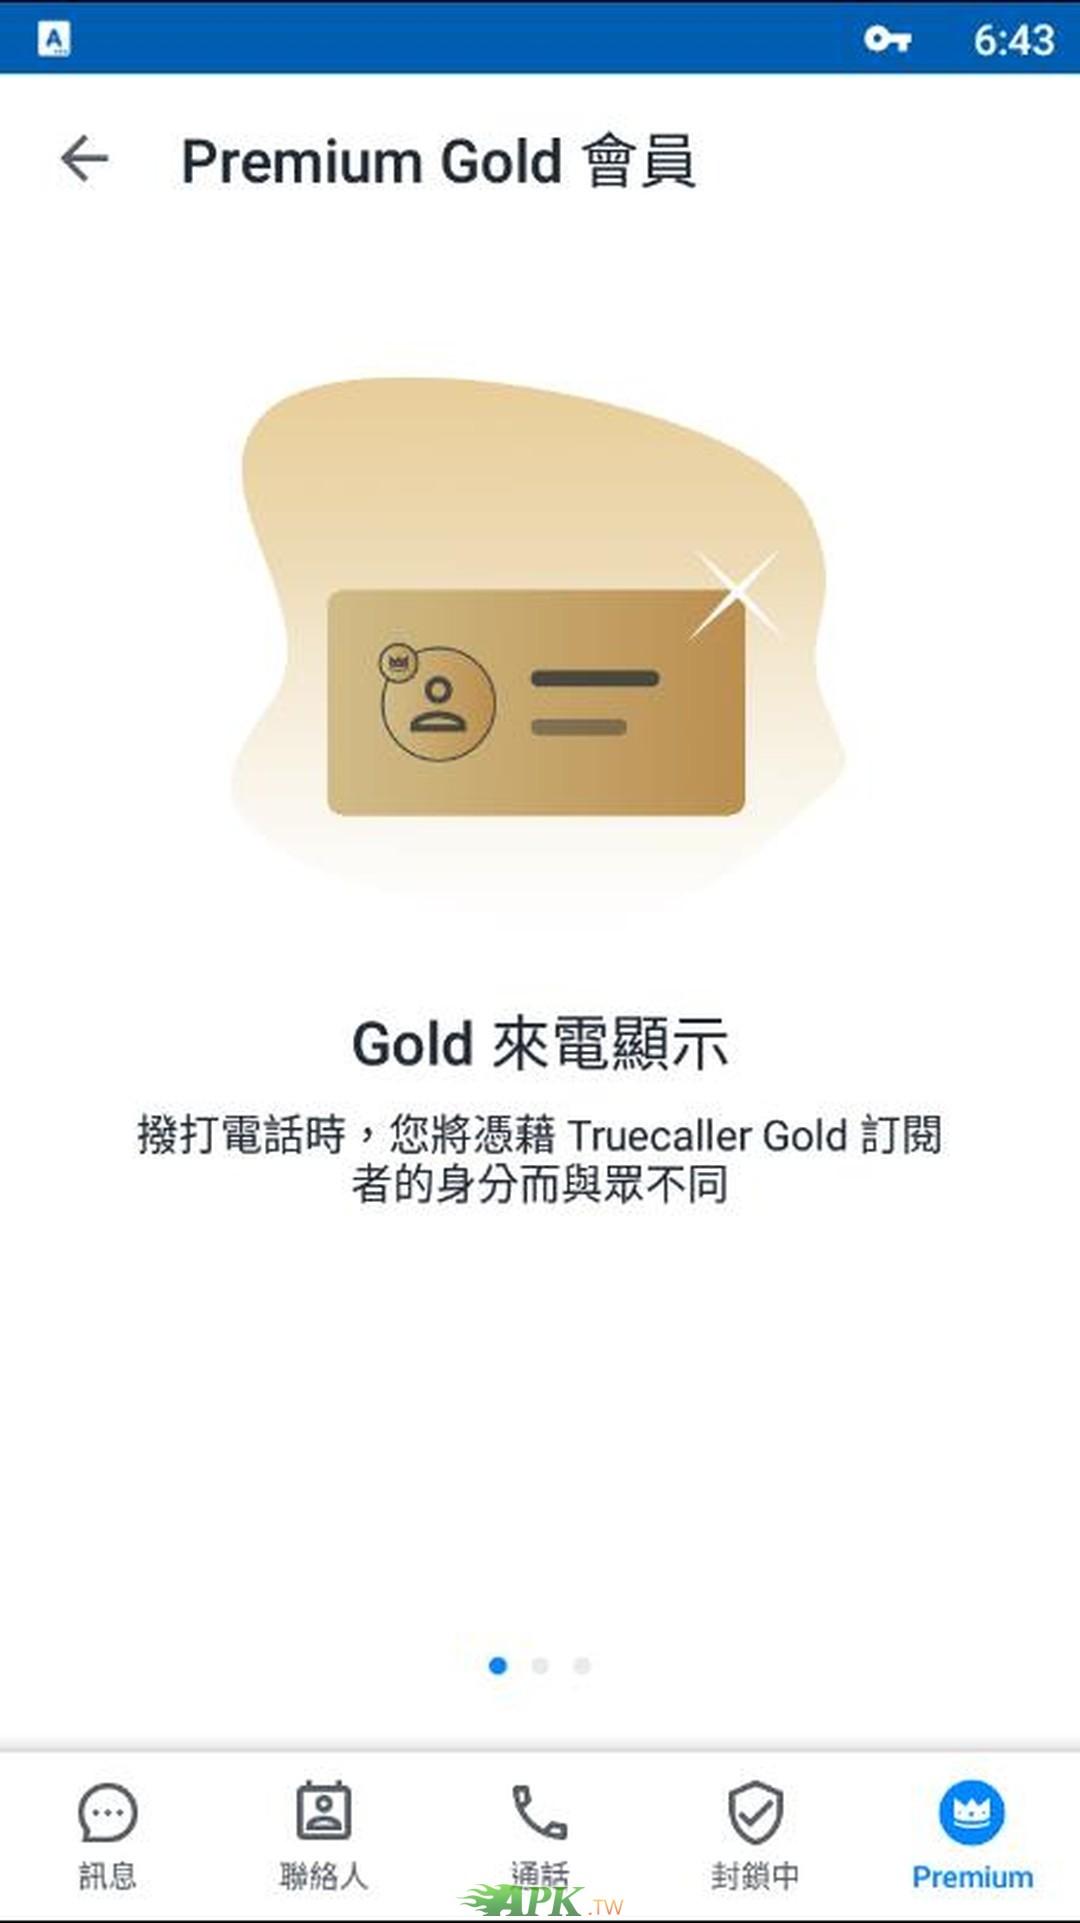 Truecaller_Premium_3_Gold.jpg